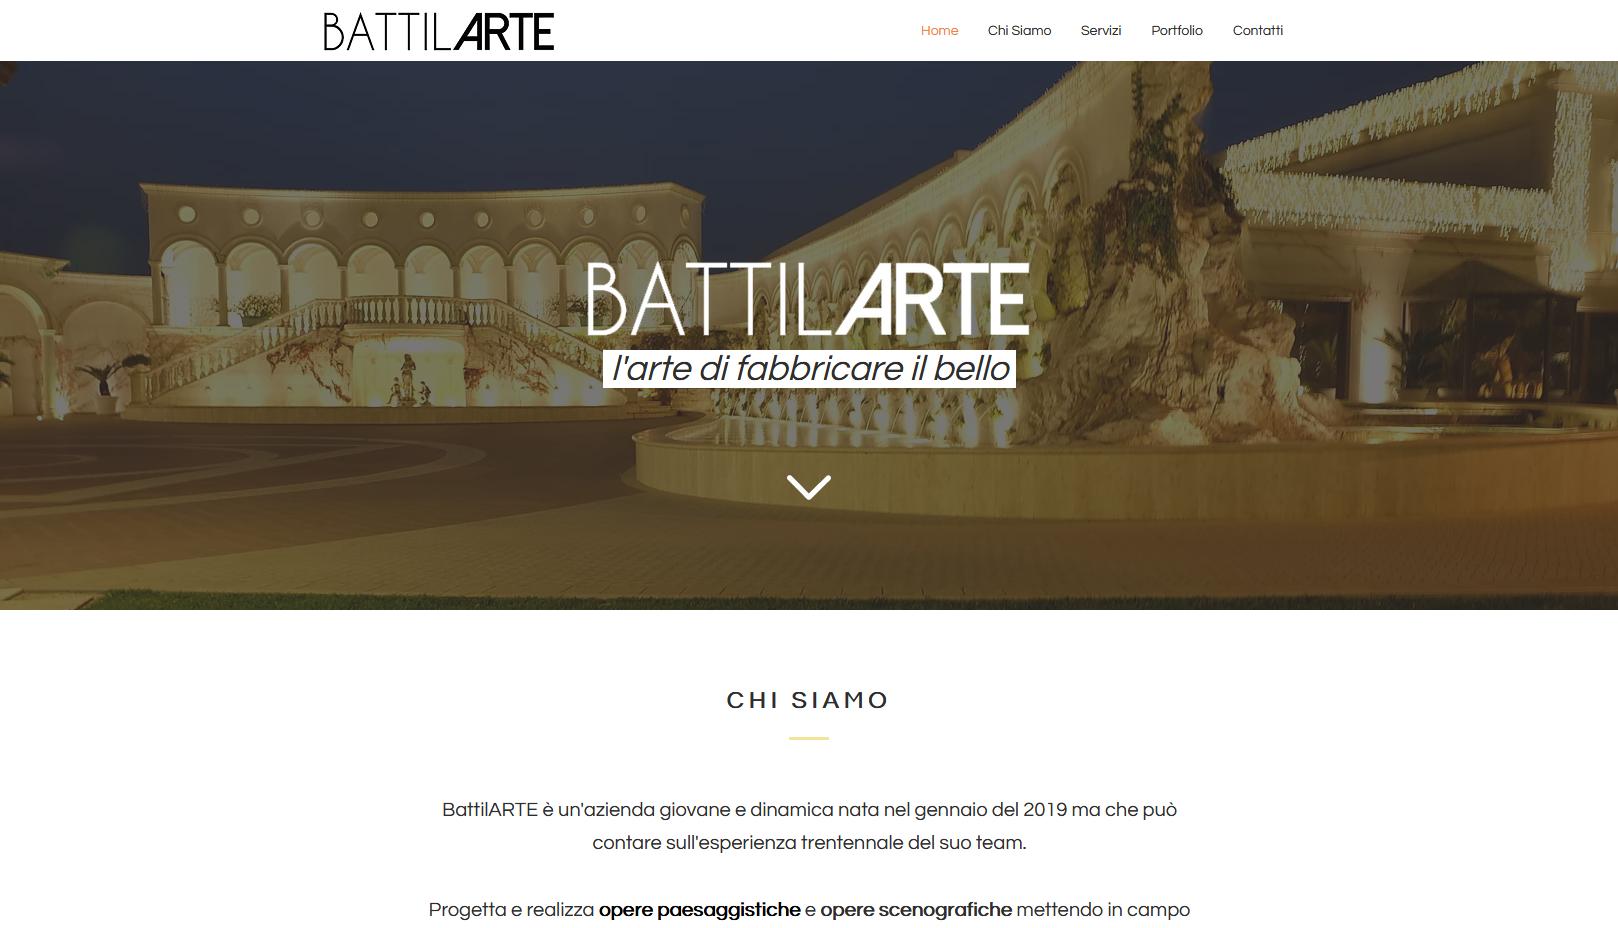 Screenshot_2020-03-06 Home Battilarte.pn